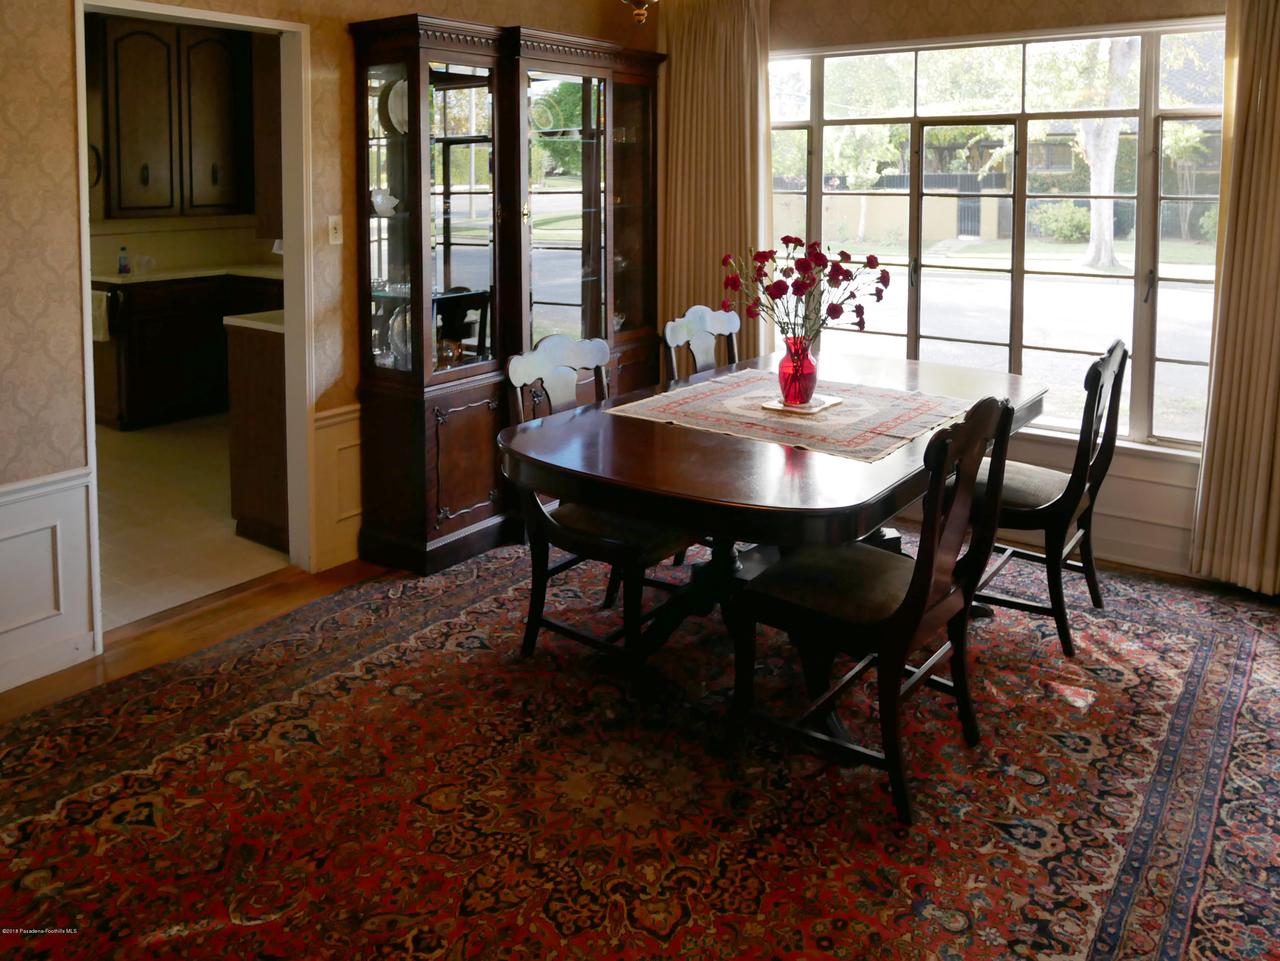 2432 ORANGE GROVE, Pasadena, CA 91104 - Dining Room 1